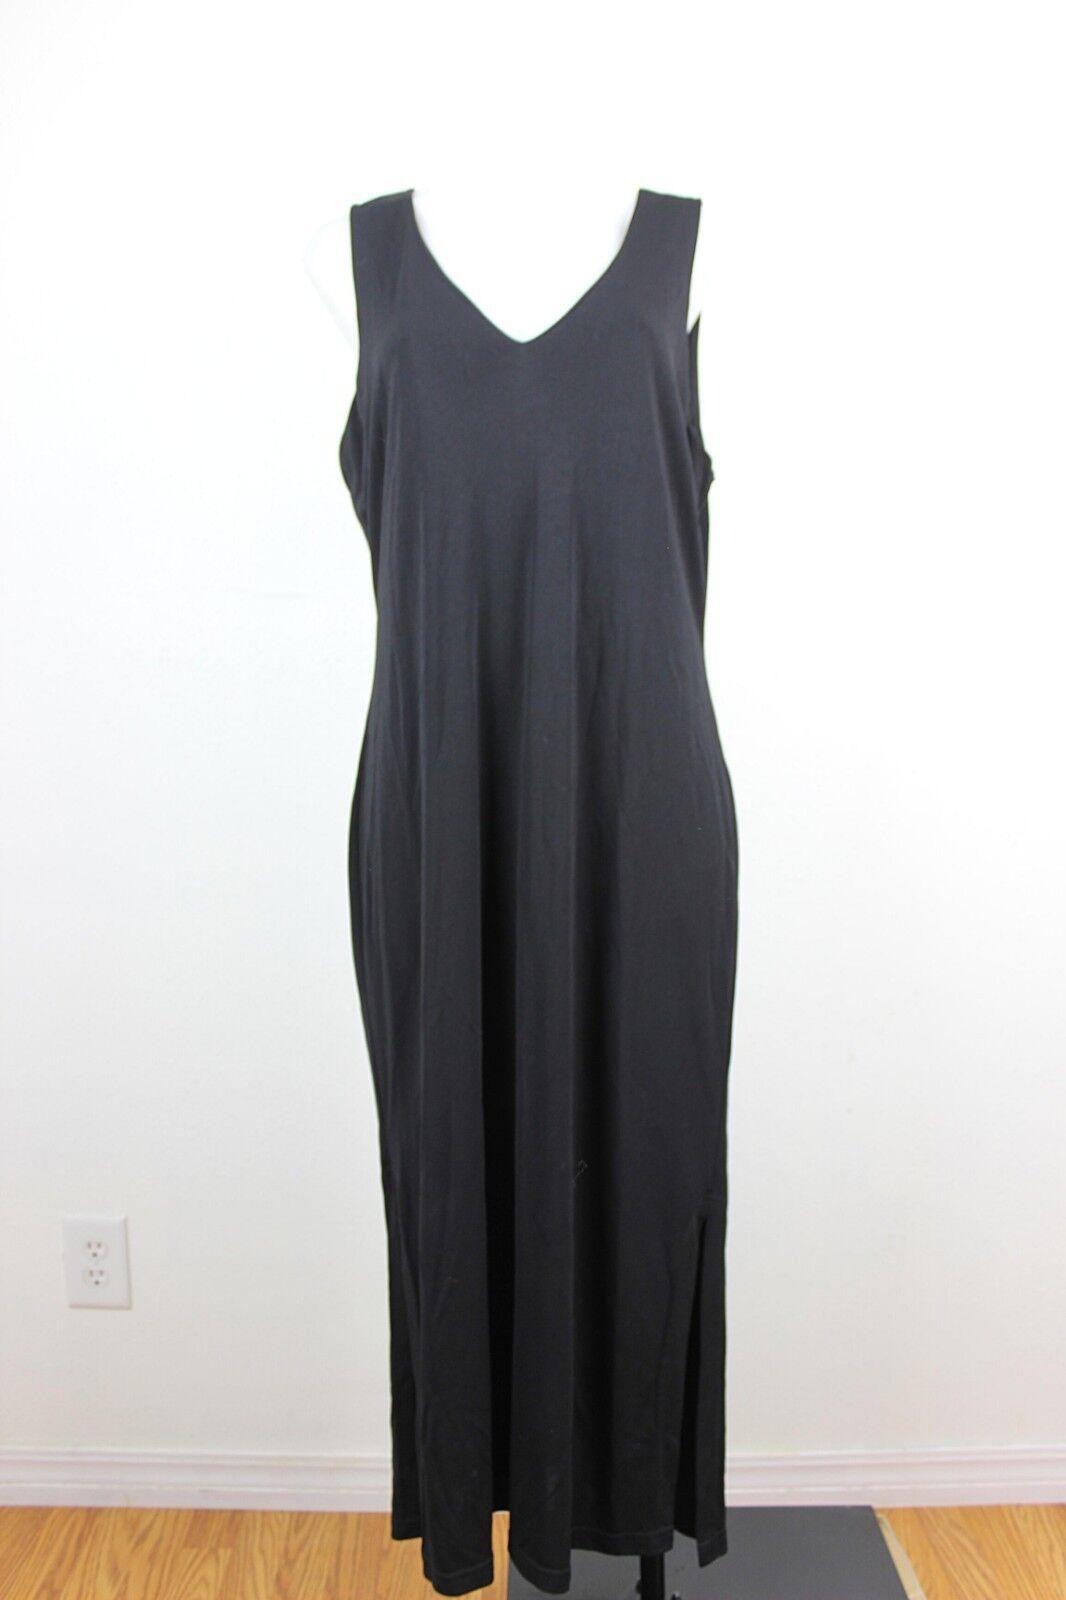 Hugo Buscati Collection Sleeveless Side Slits Midi Dress XL